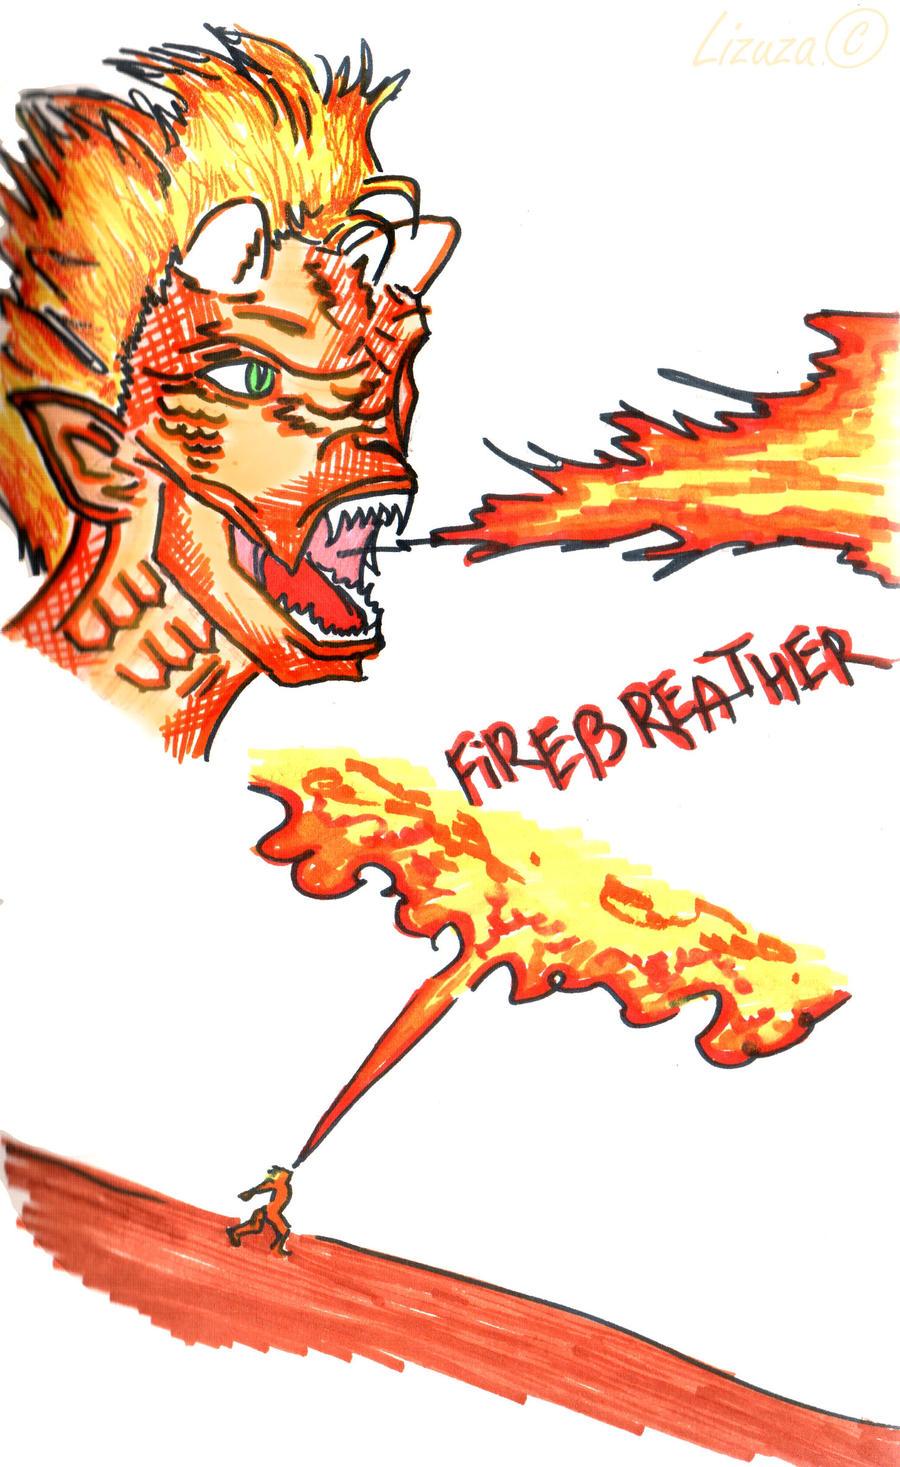 Comic Fanfic Mini Comic On Firebreathermovie Deviantart